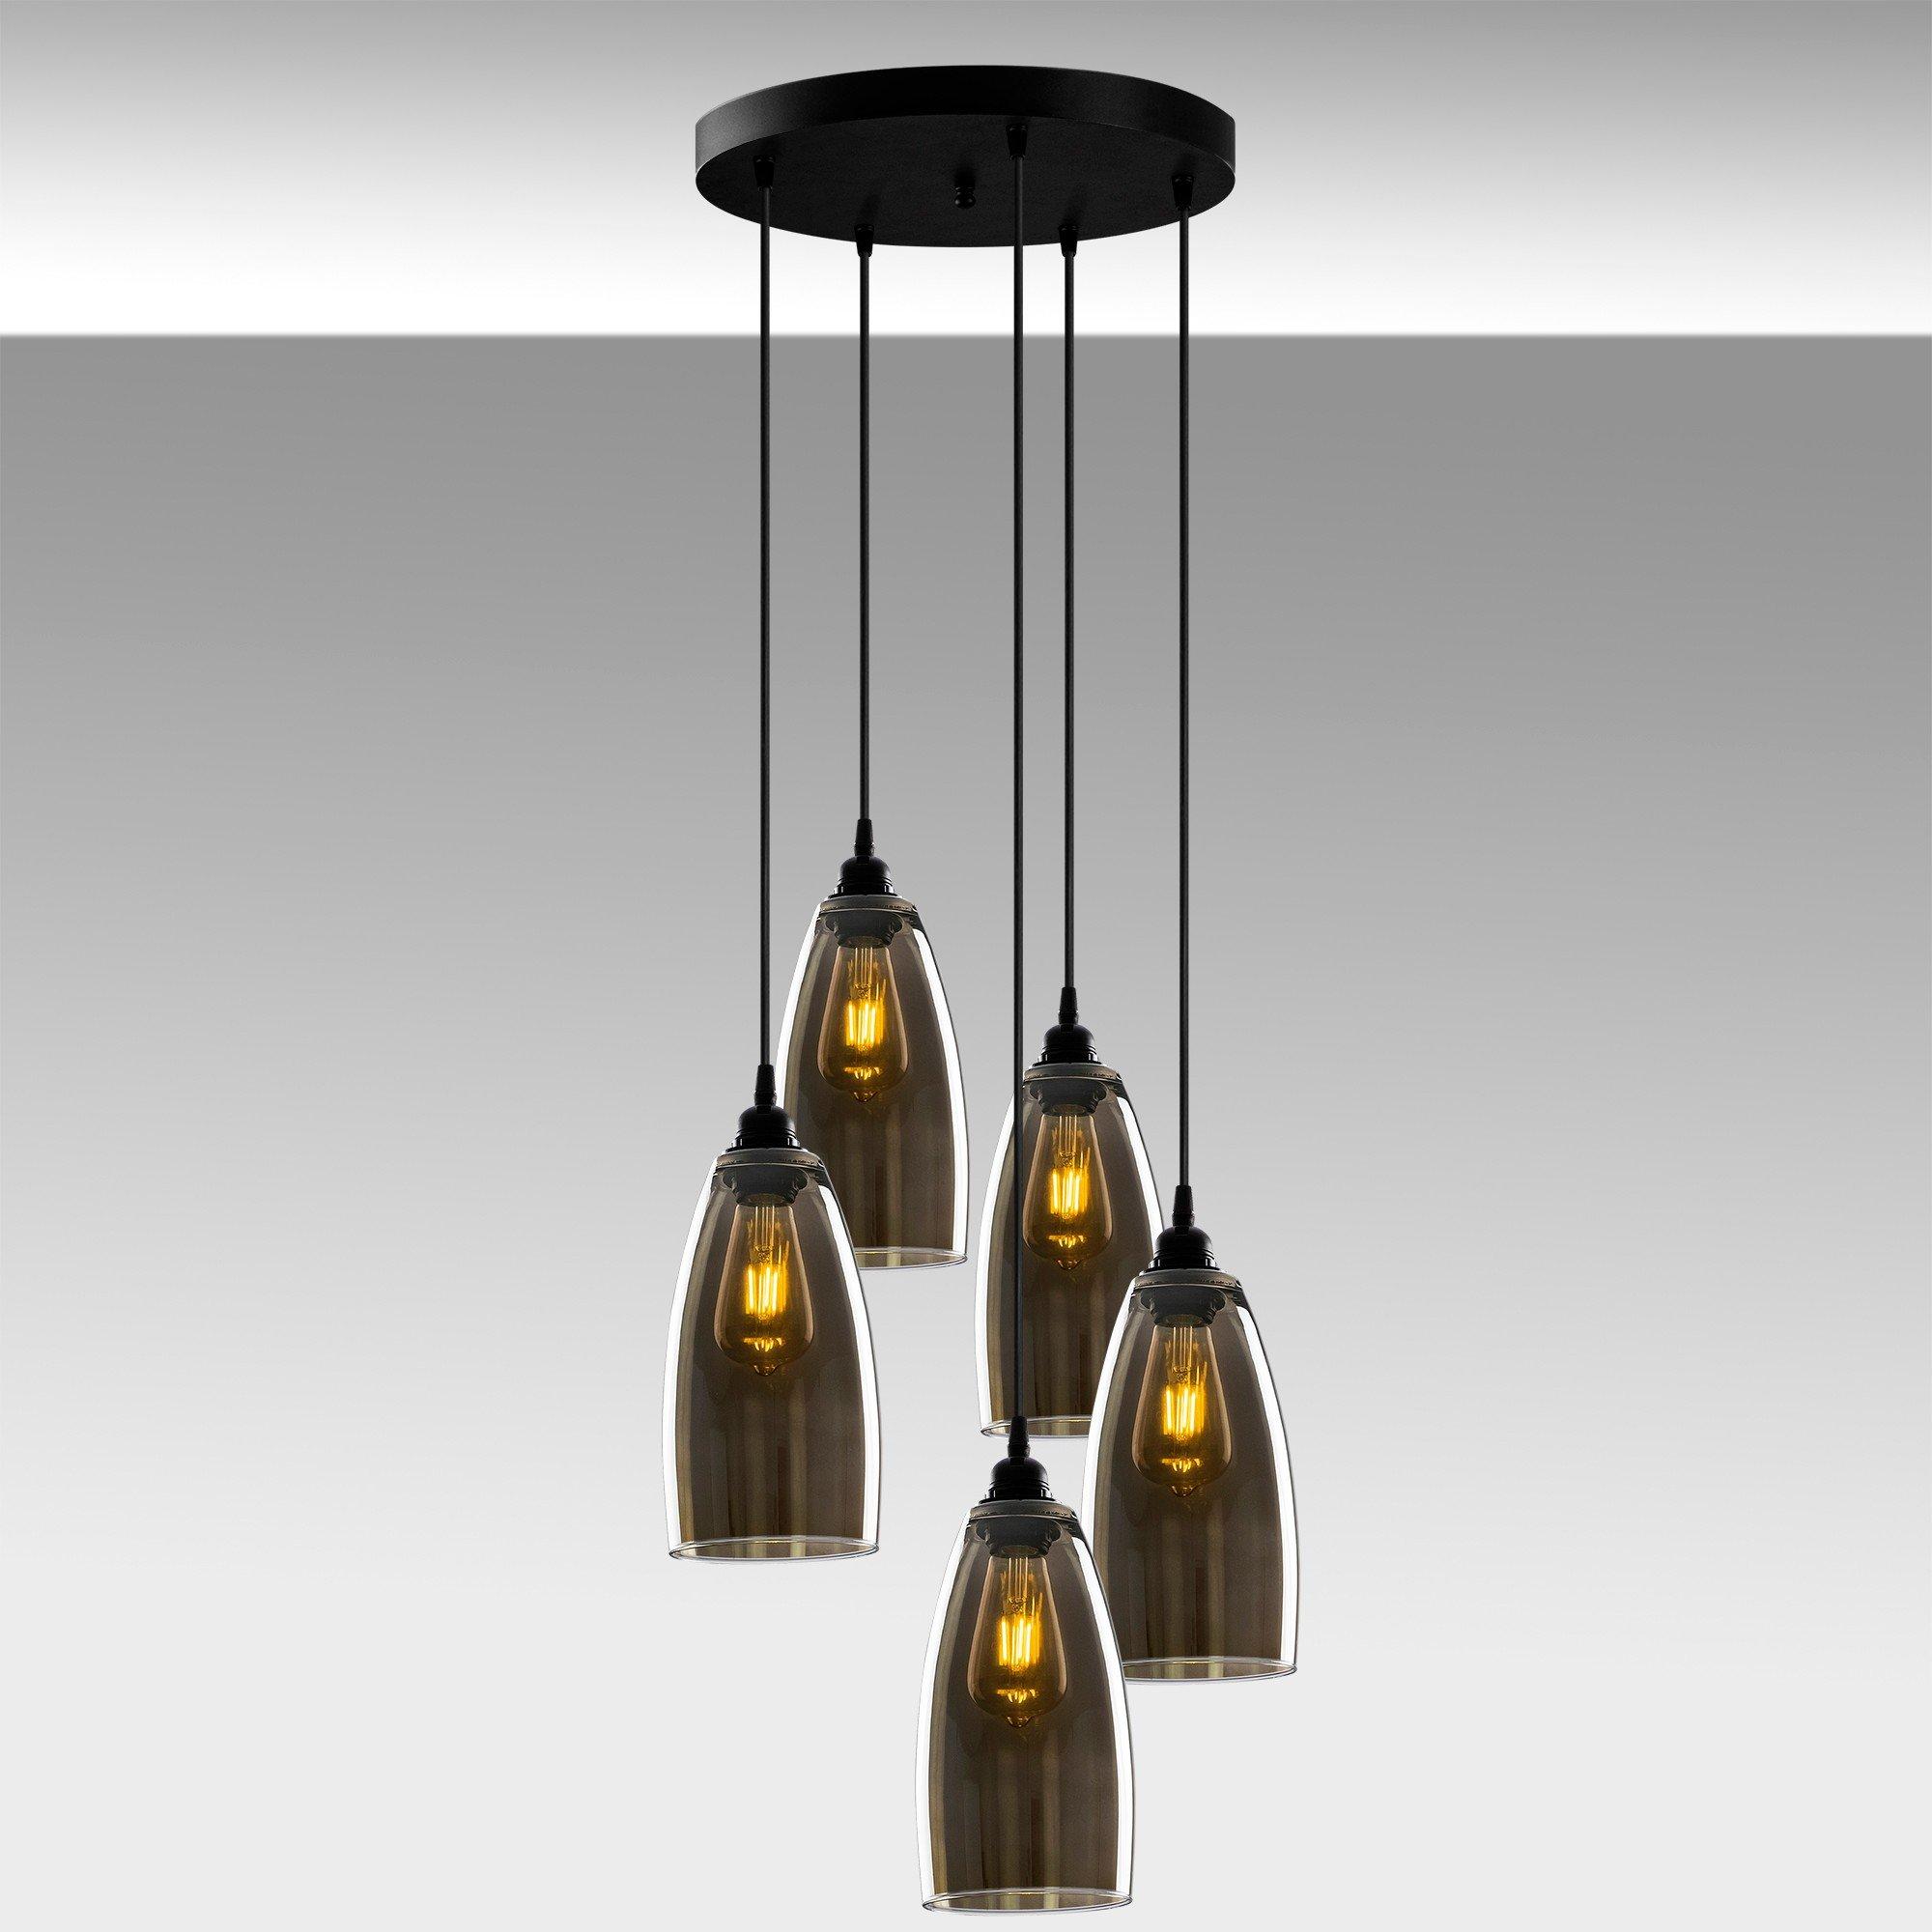 Hanglamp smoked glass donker langwerpig 5 keer een E27 fitting - sfeerfoto